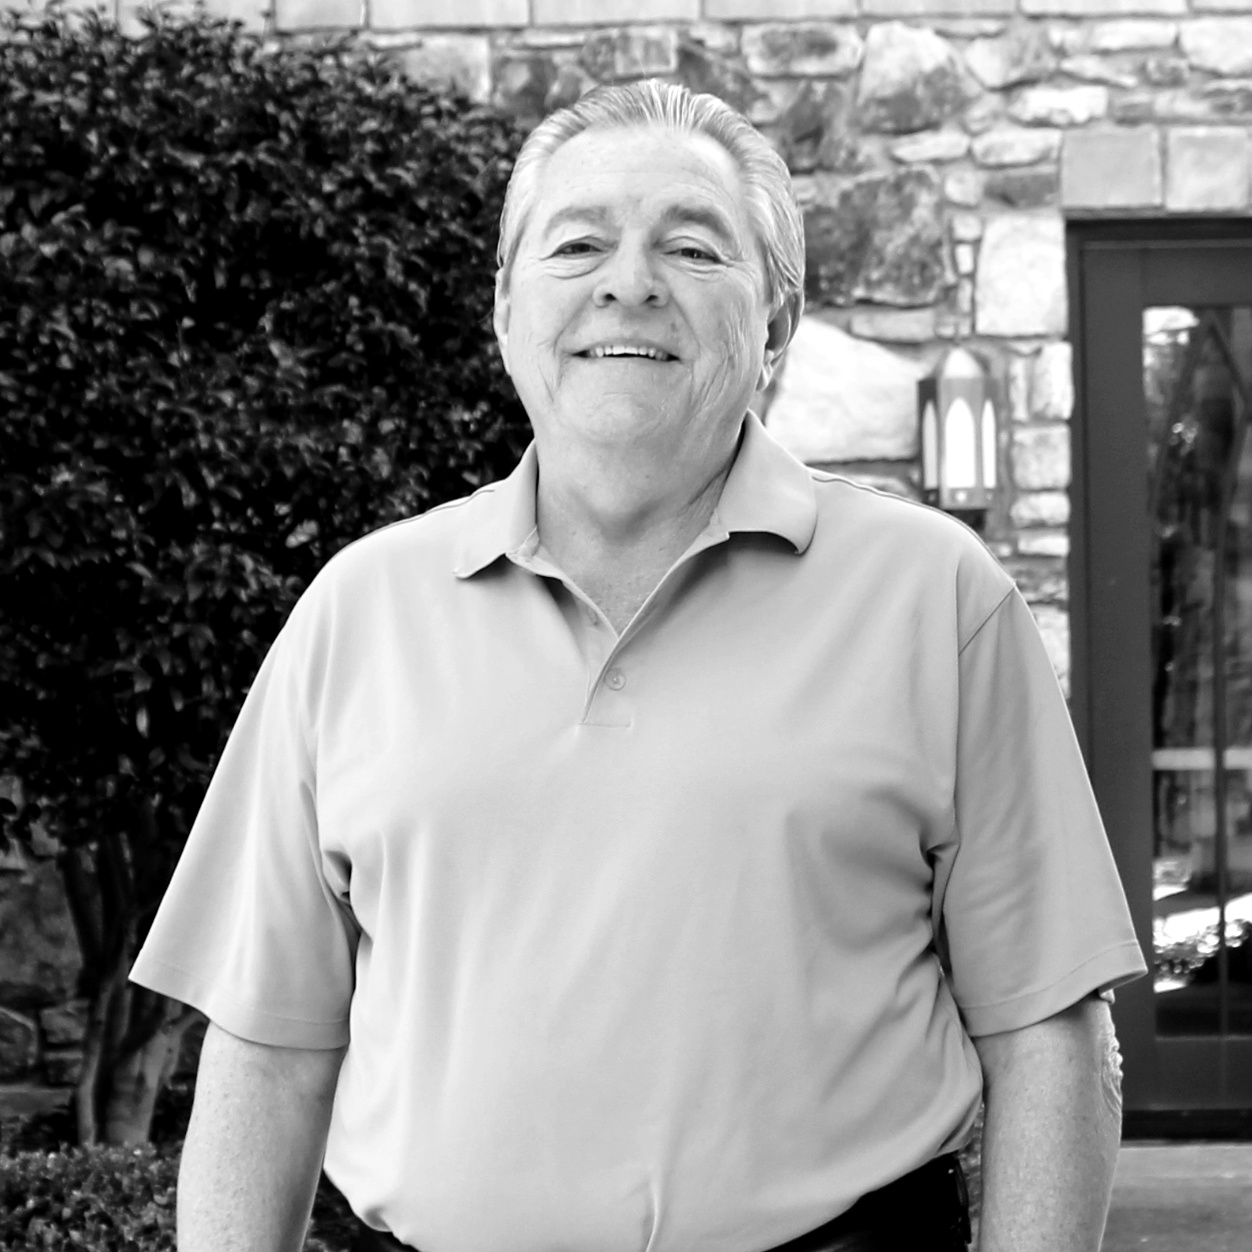 Danny Ferguson Facilities Manager   dferguson@chrismethodist.org (919)969-8820 ext.